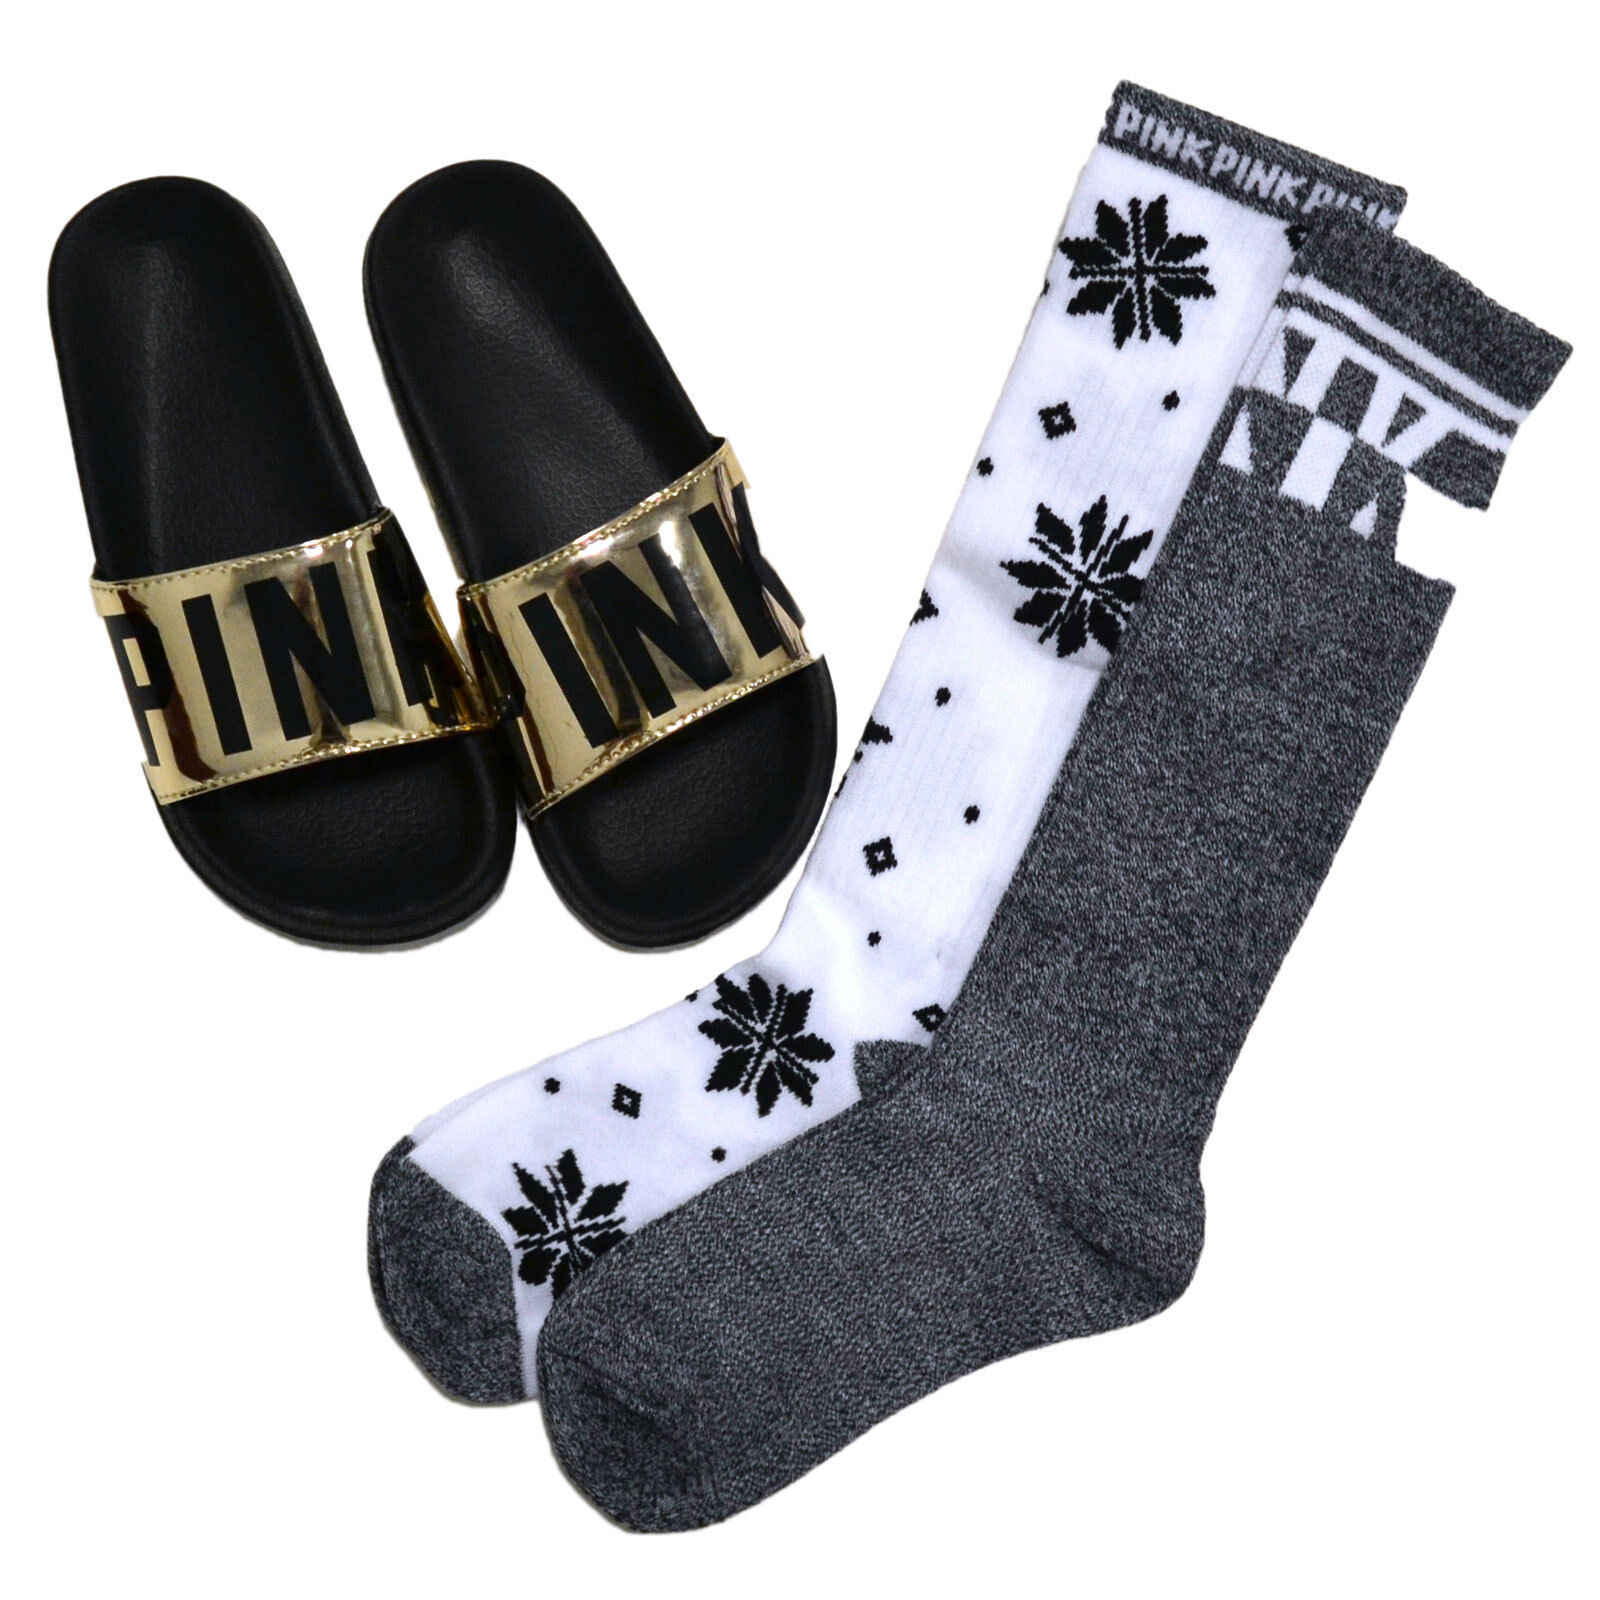 Victoria's Secret Pink Slides & Socks Gift Set 3 Piece Knee High Sandals New Nwt